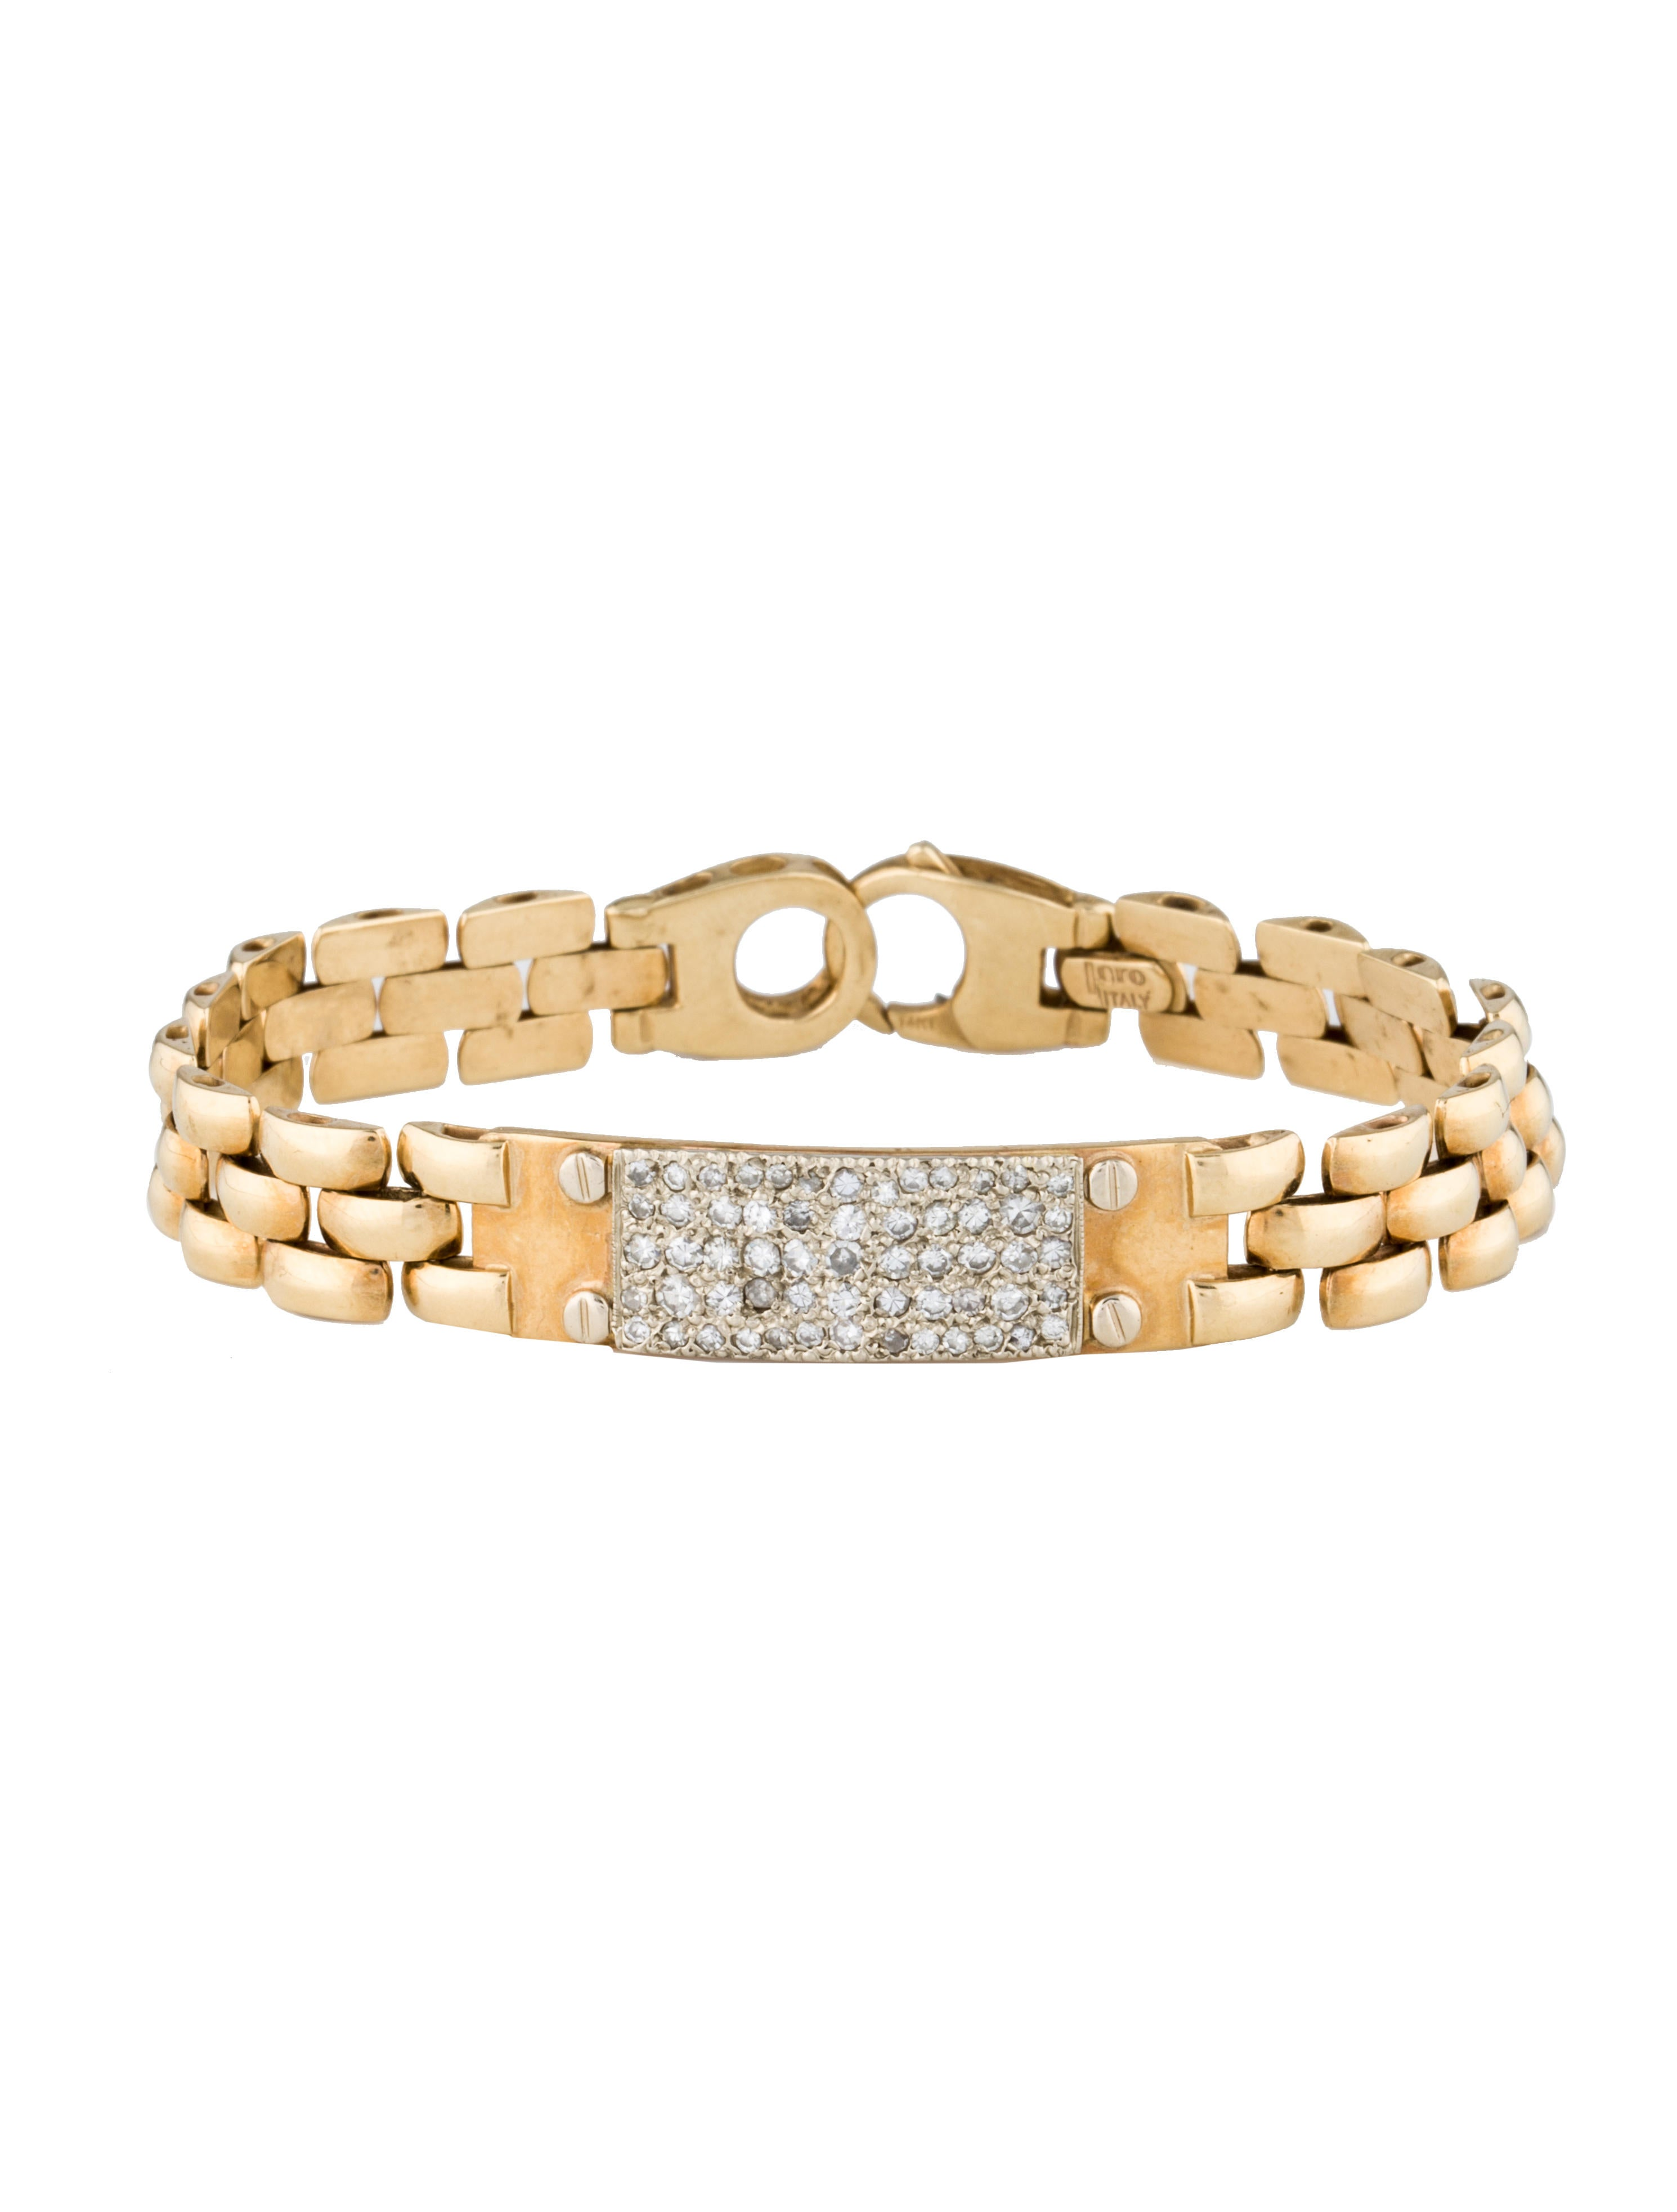 14k gold diamond id bracelet bracelets fjb21728. Black Bedroom Furniture Sets. Home Design Ideas